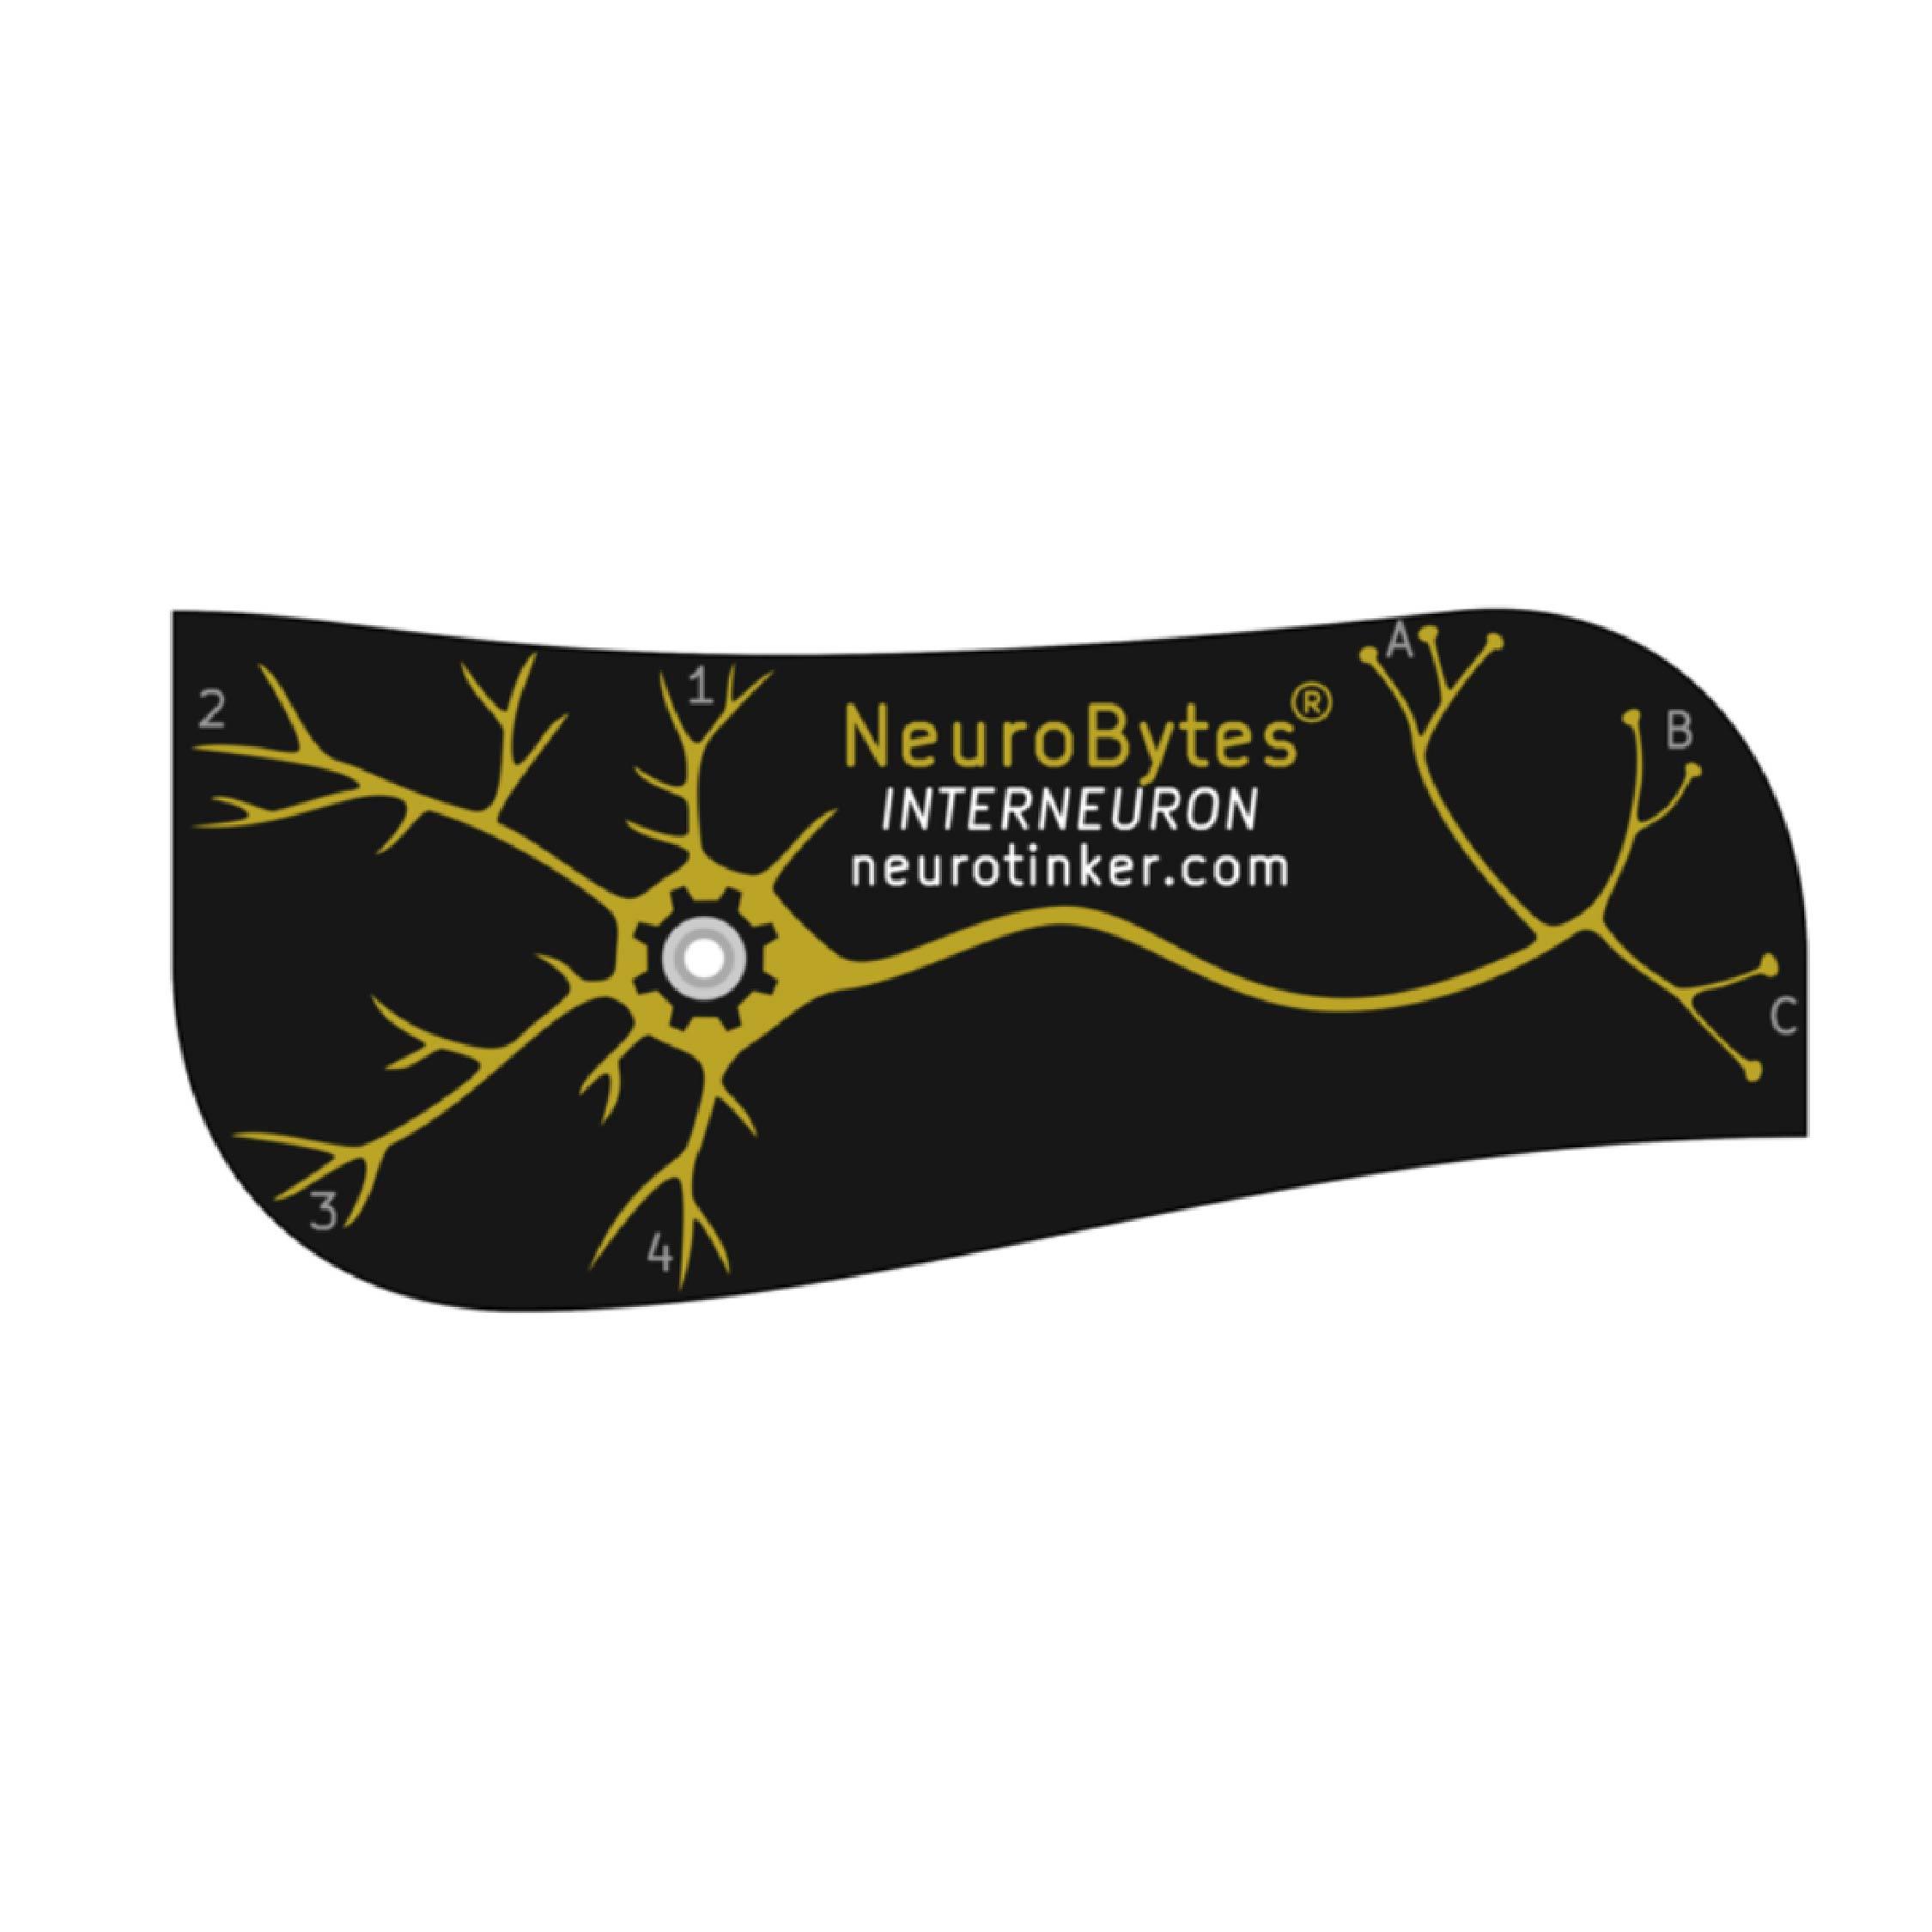 neurobytes_interneuron.jpg